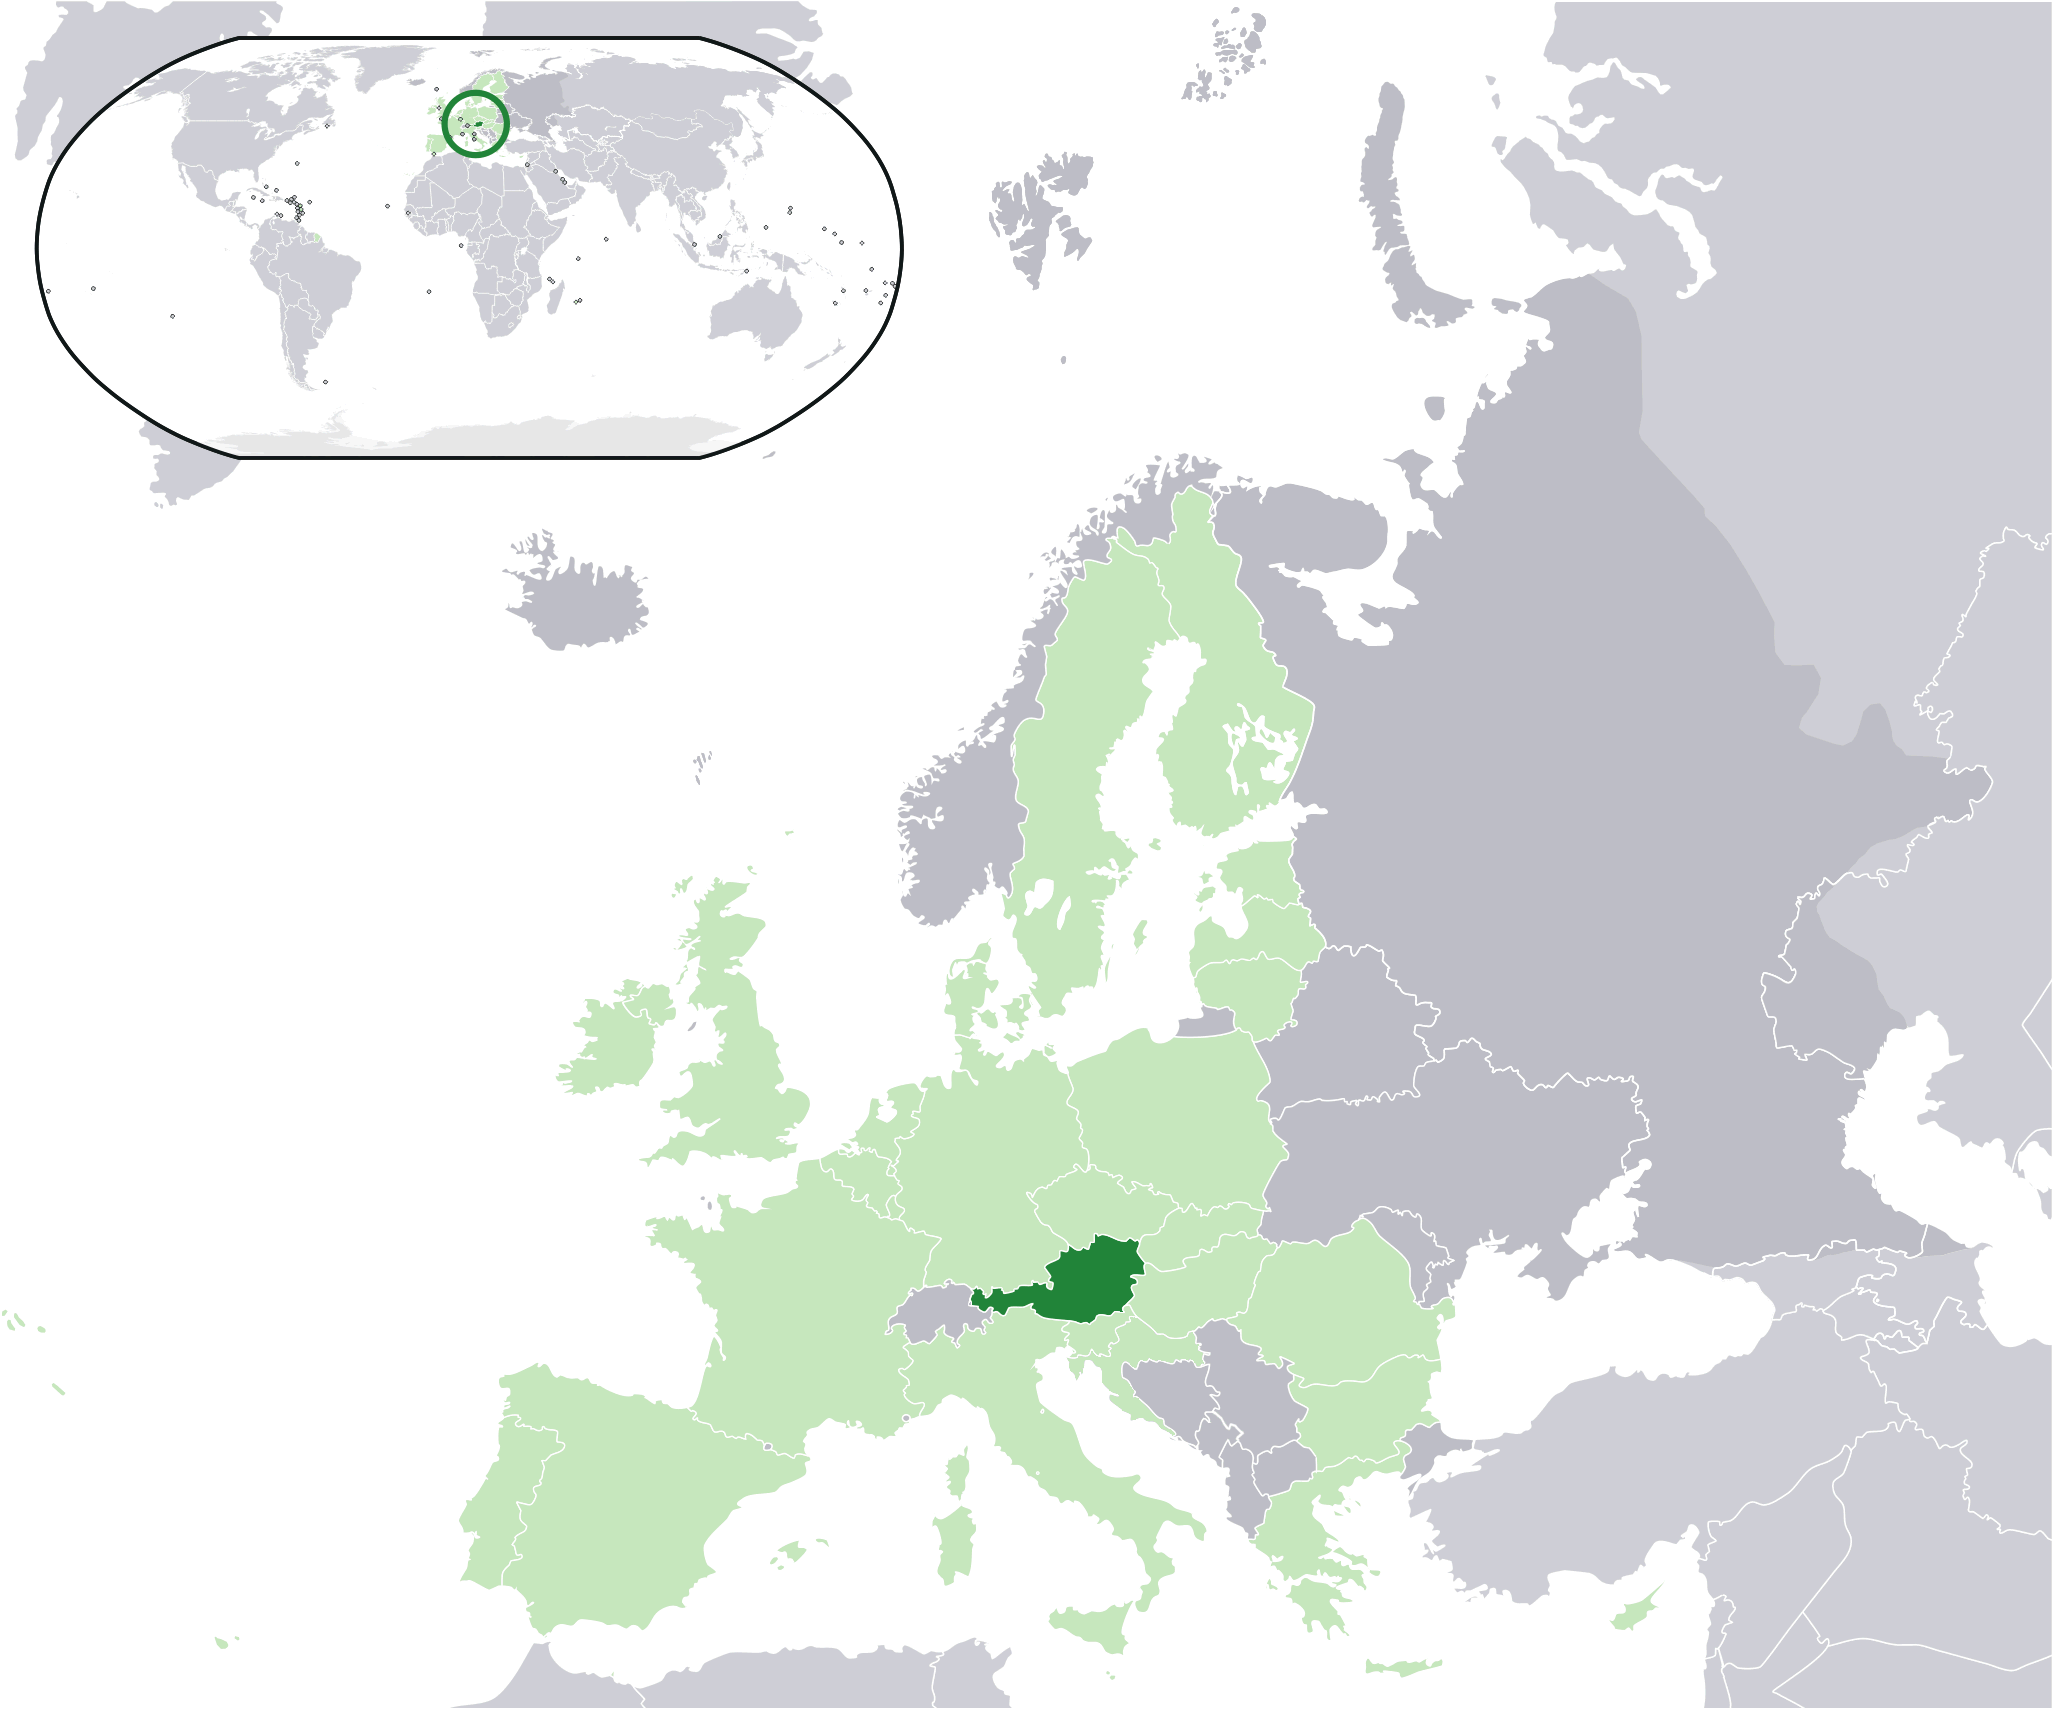 Filelocation austria eu europeg wikimedia commons filelocation austria eu europeg gumiabroncs Image collections